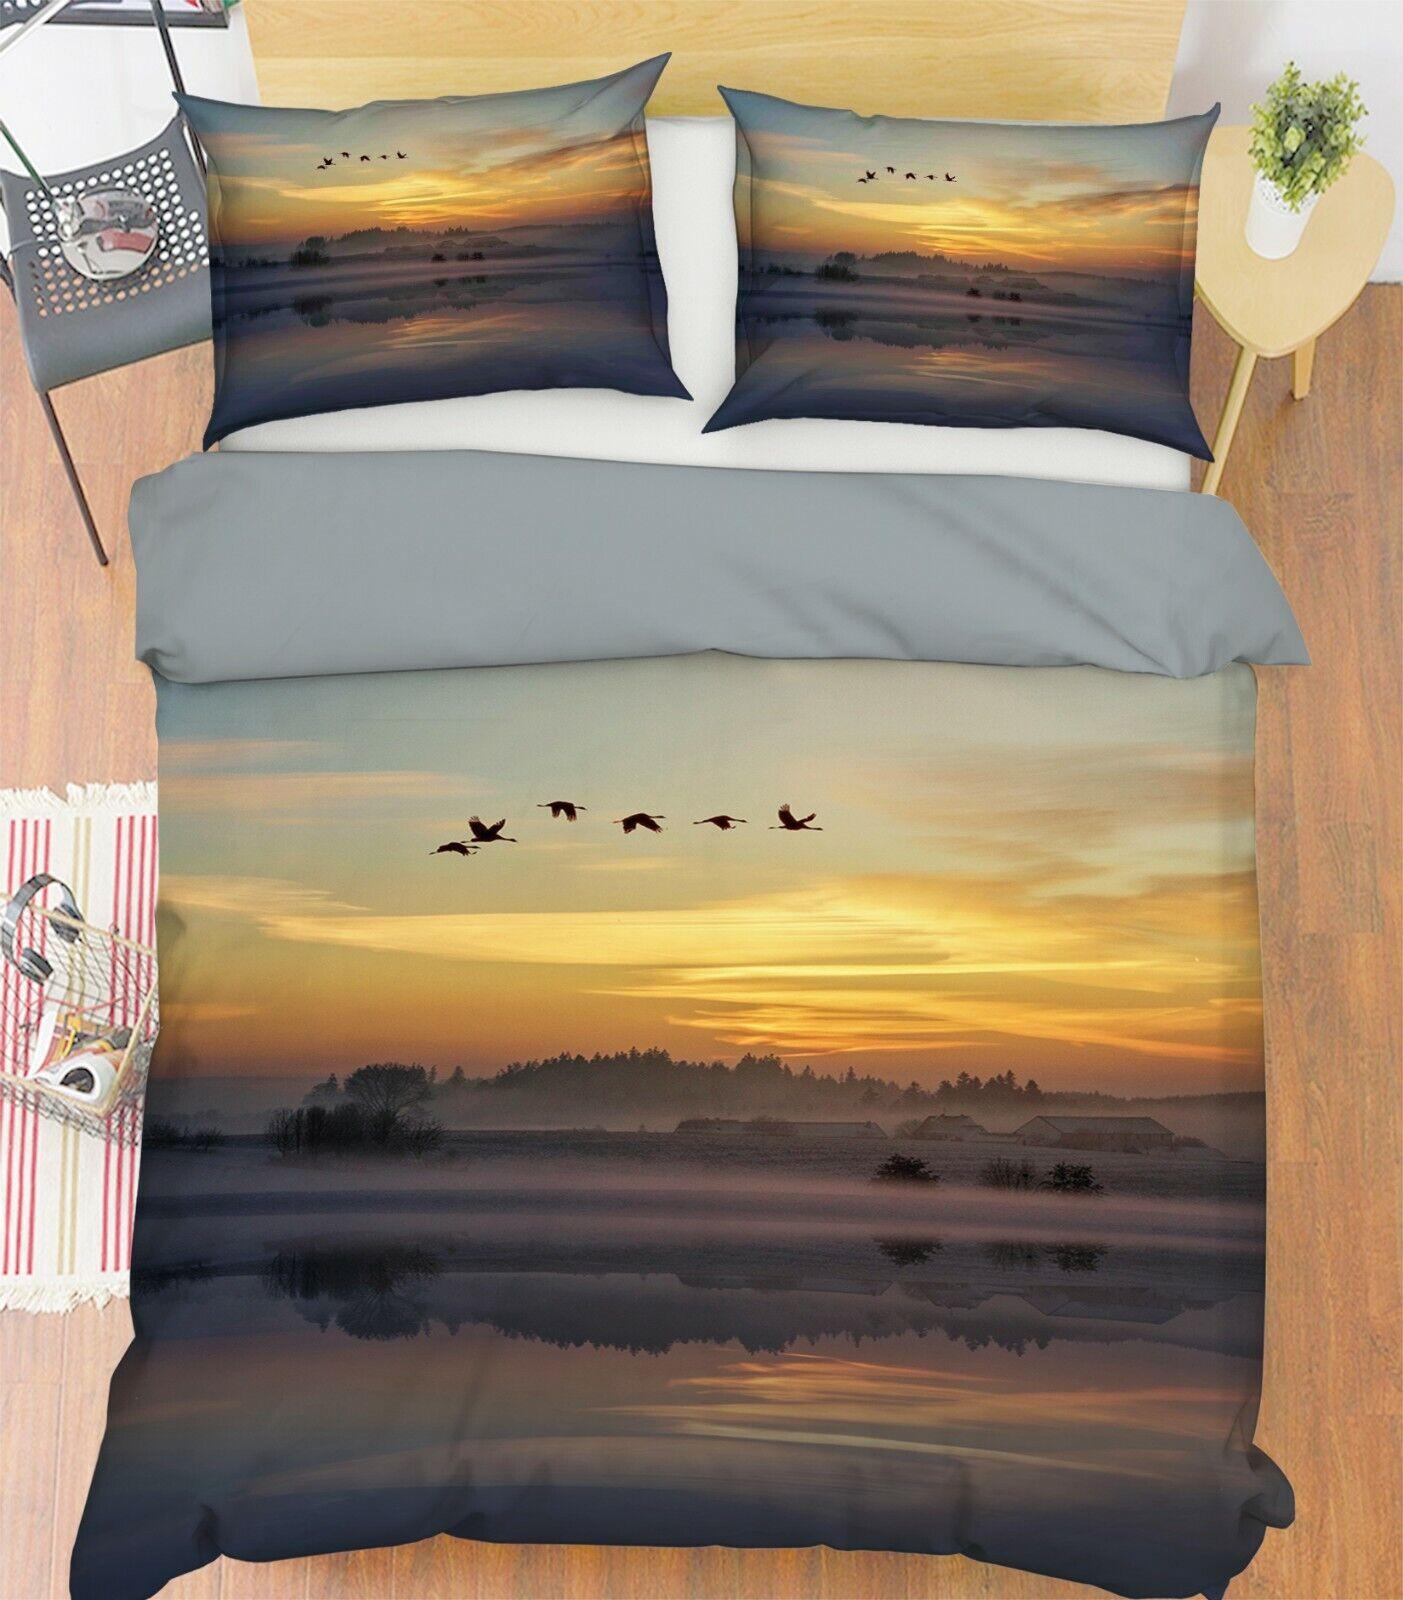 3D Sunset I95 Animal Bett Pillowcases Quilt Duvet Startseite Königin König Angelia